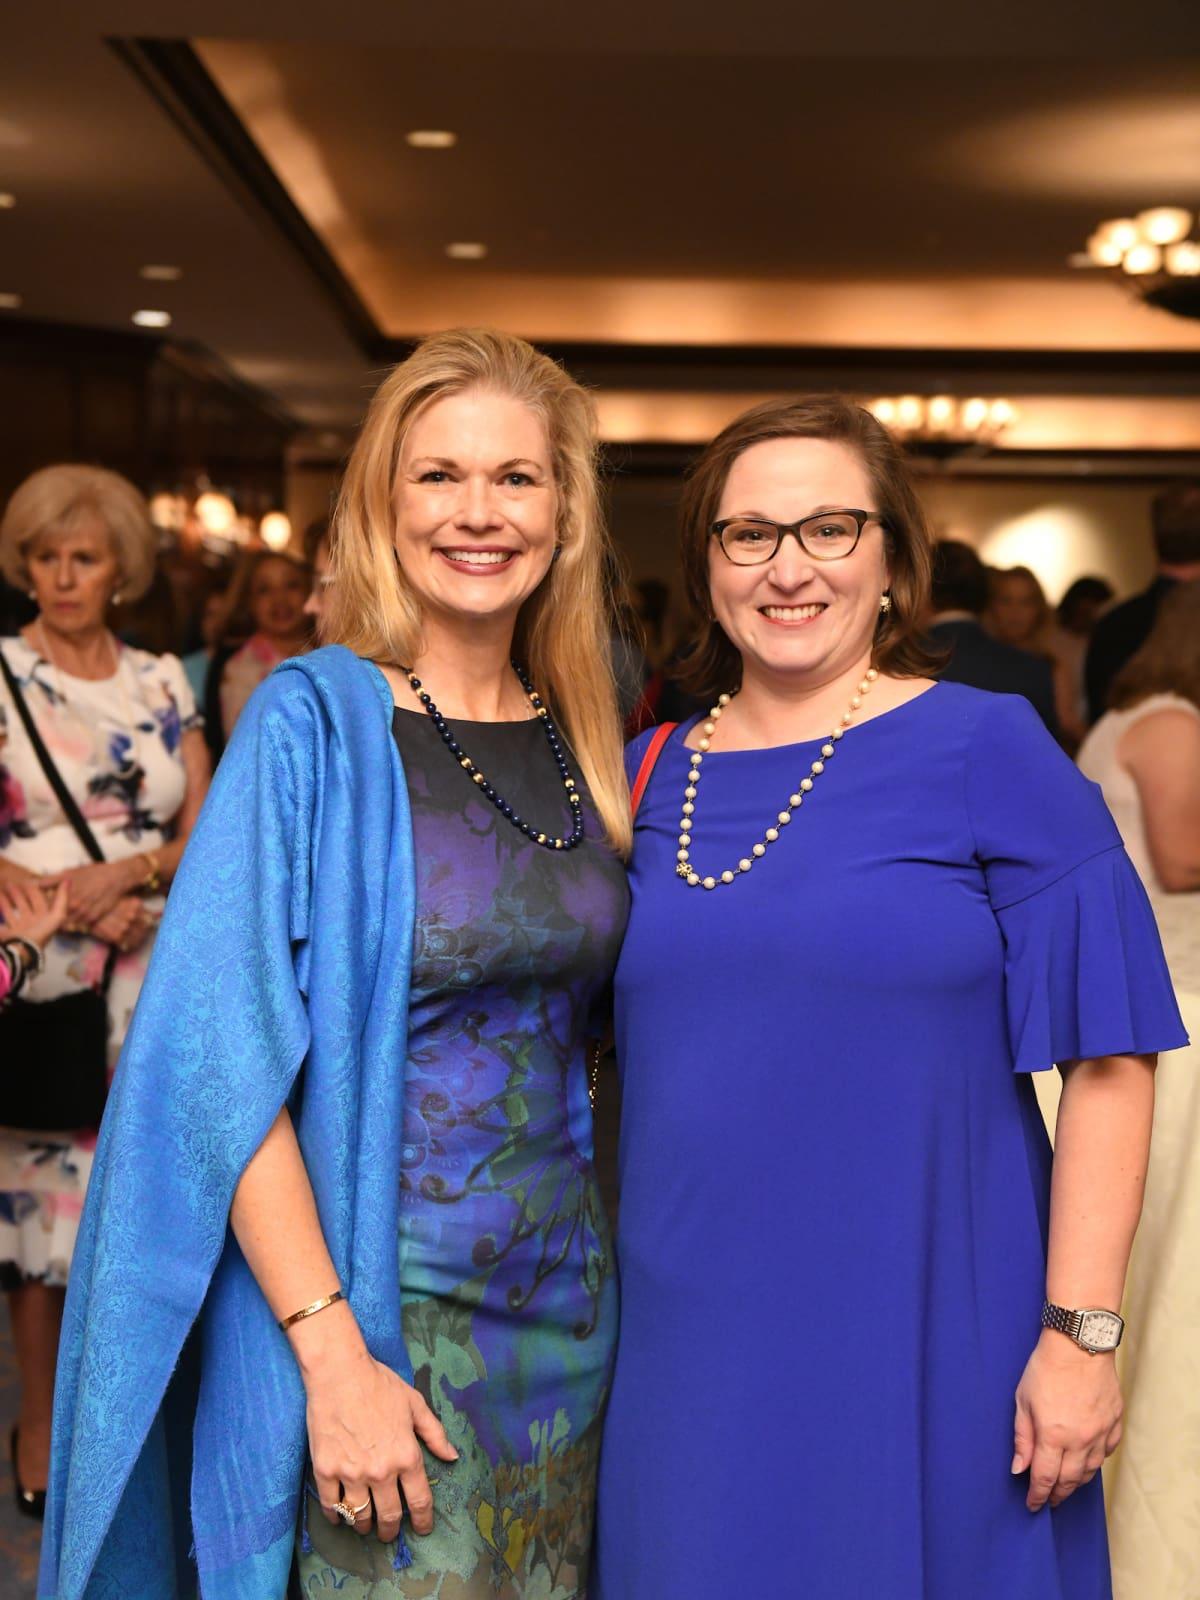 Amy Pierce, Amy Lampi/Judys Mission